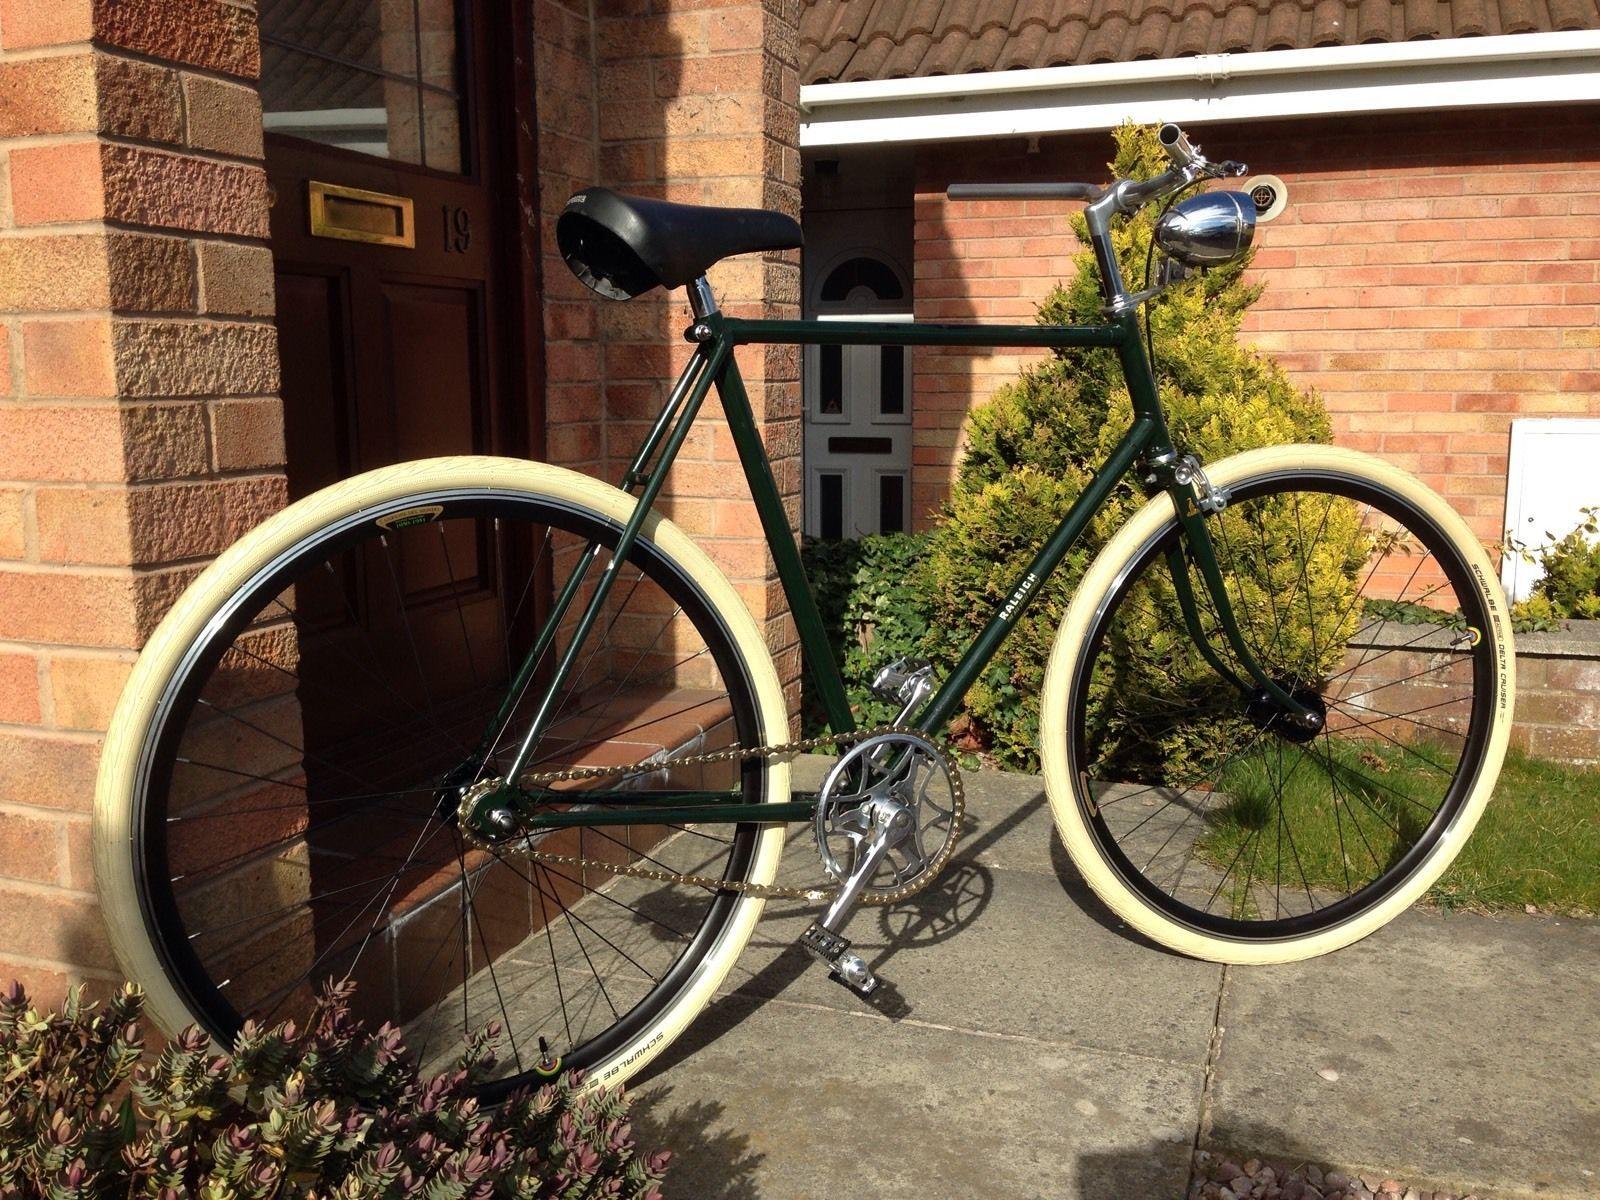 Vintage Raleigh The All Steel Bicycle Fixie Singlespeed Retro Bike New Parts Steel Bicycle Bicycle Retro Bike